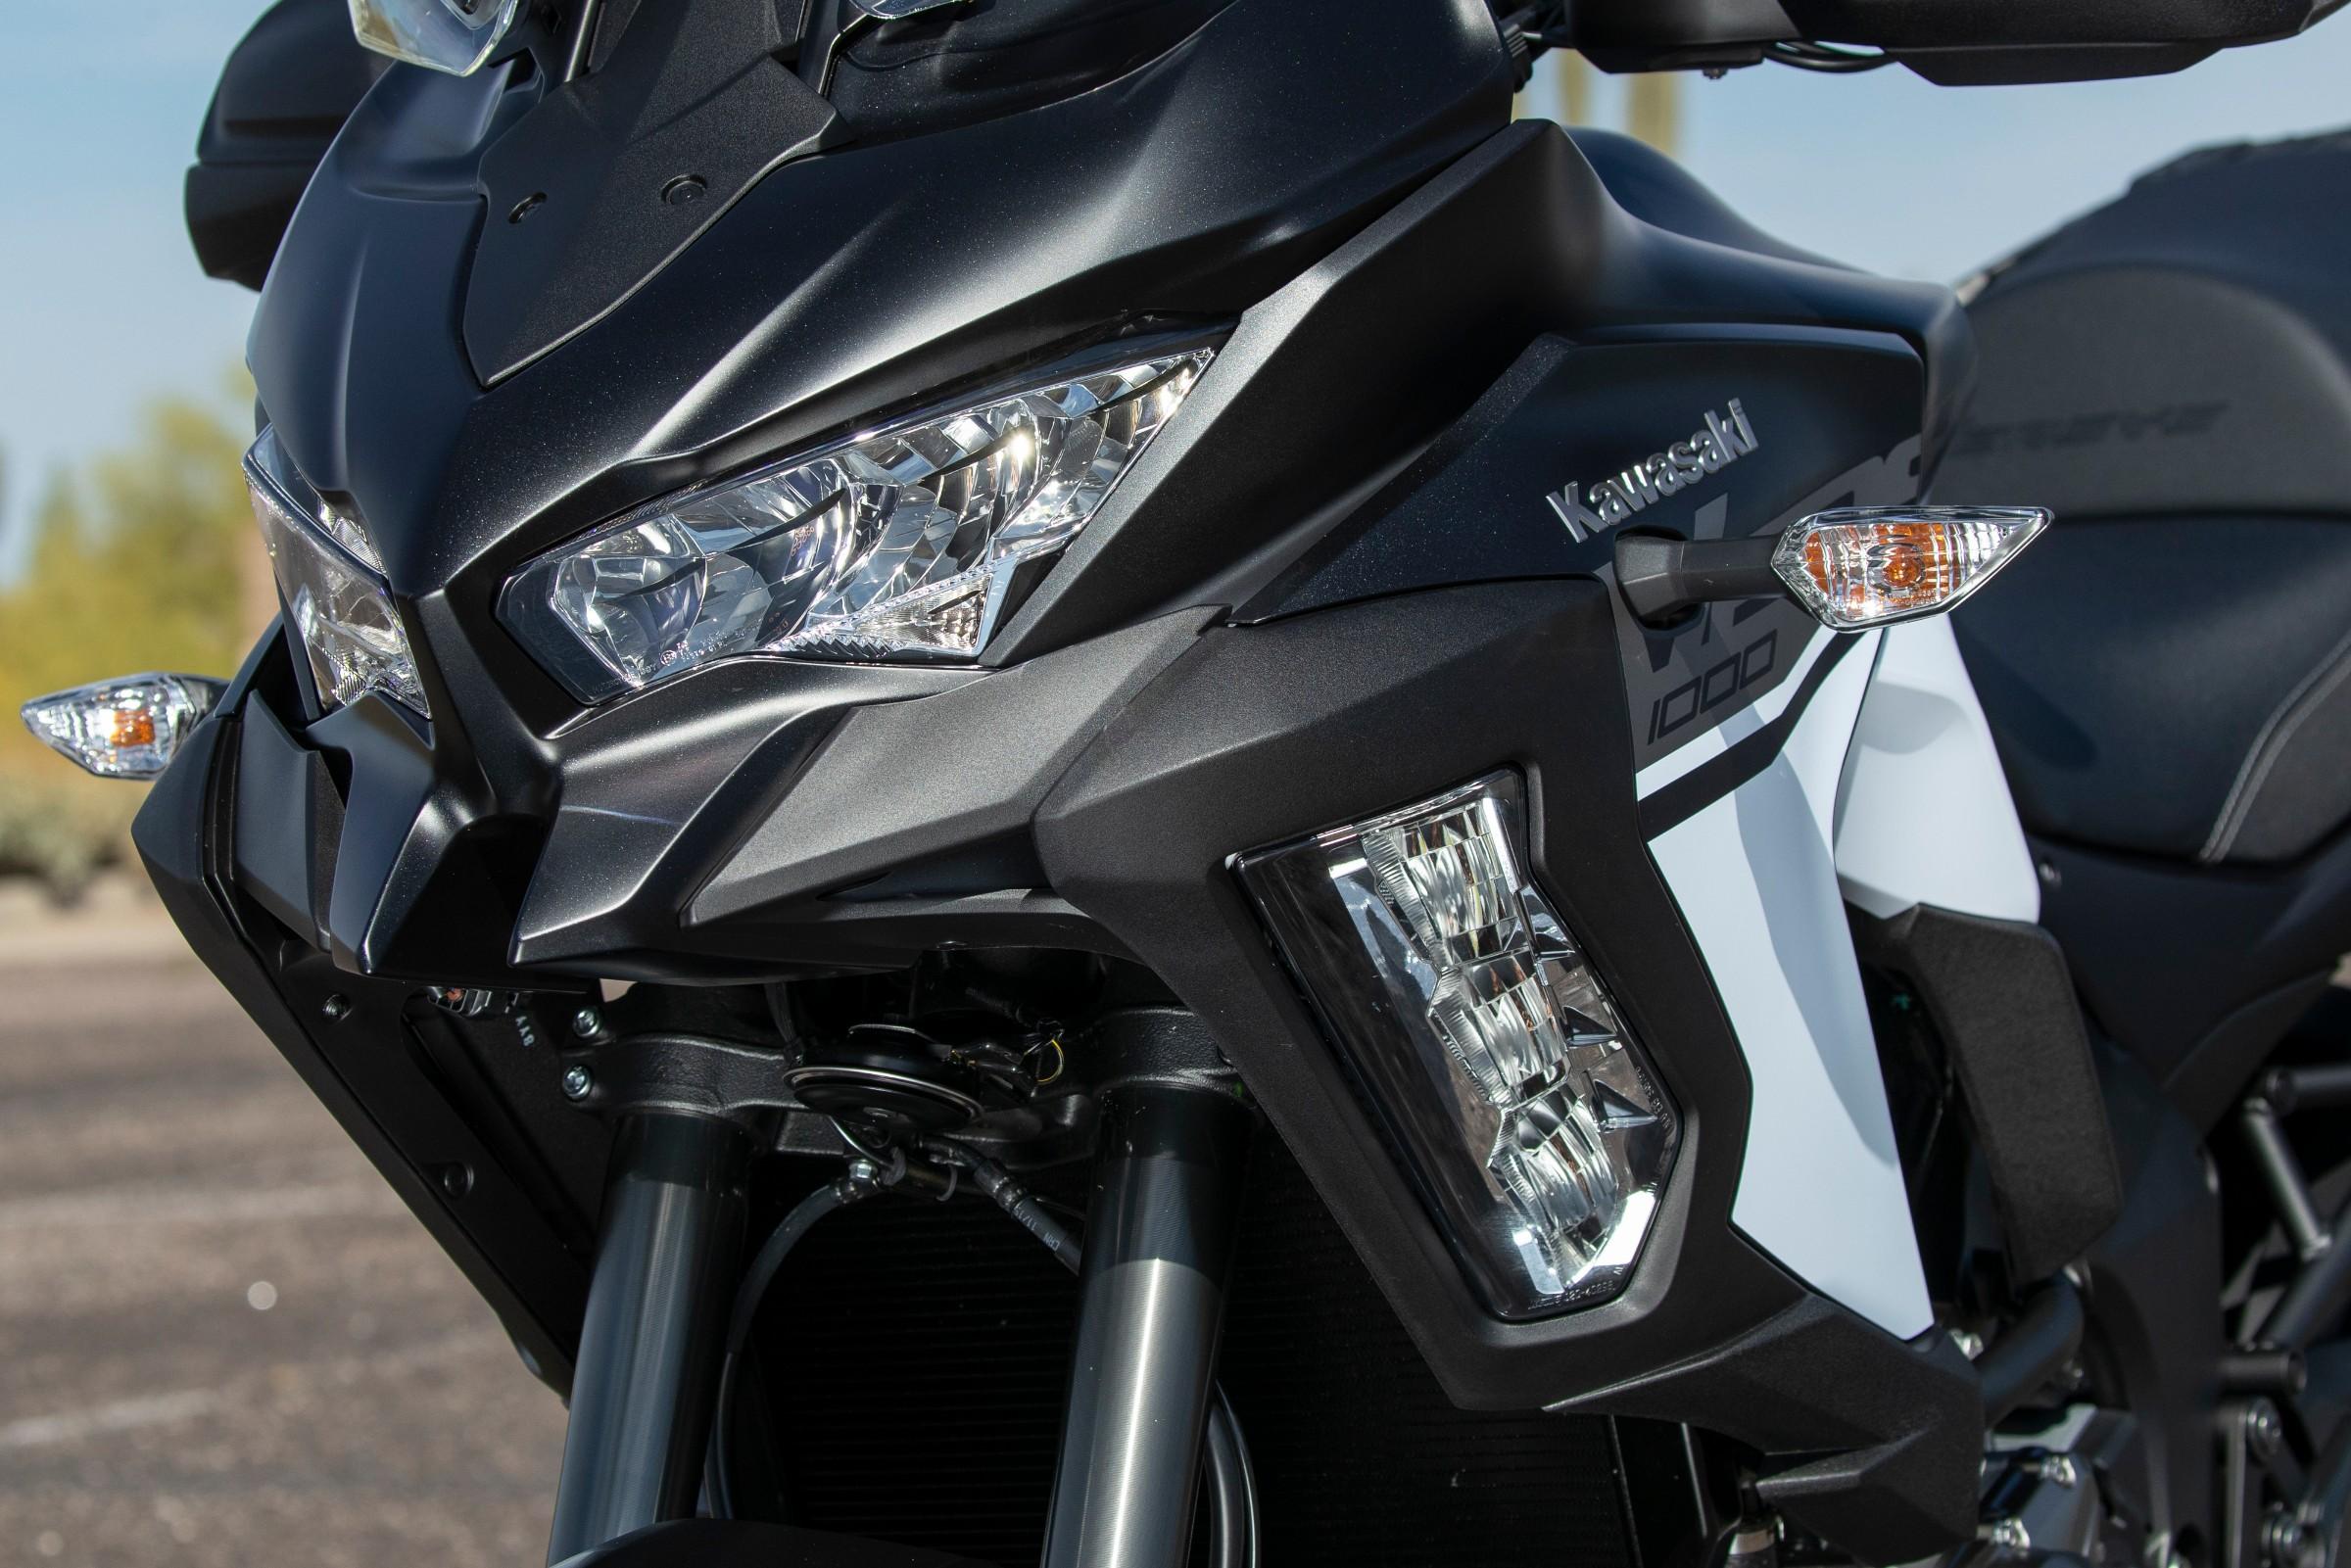 2019 Kawasaki Versys 1000 SE LT+ first ride review - RevZilla